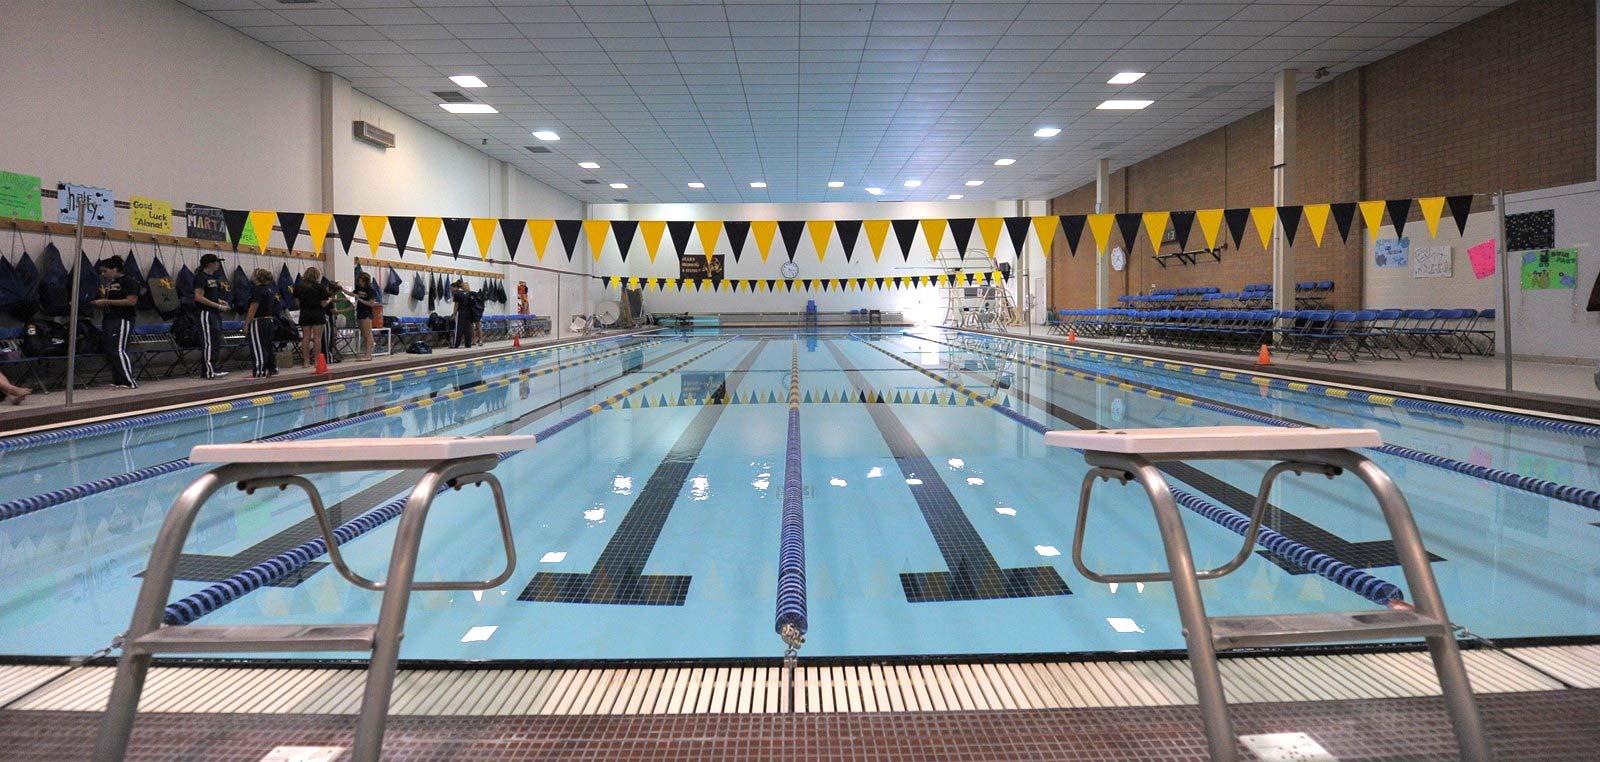 Butler-Hancock Swimming Pool